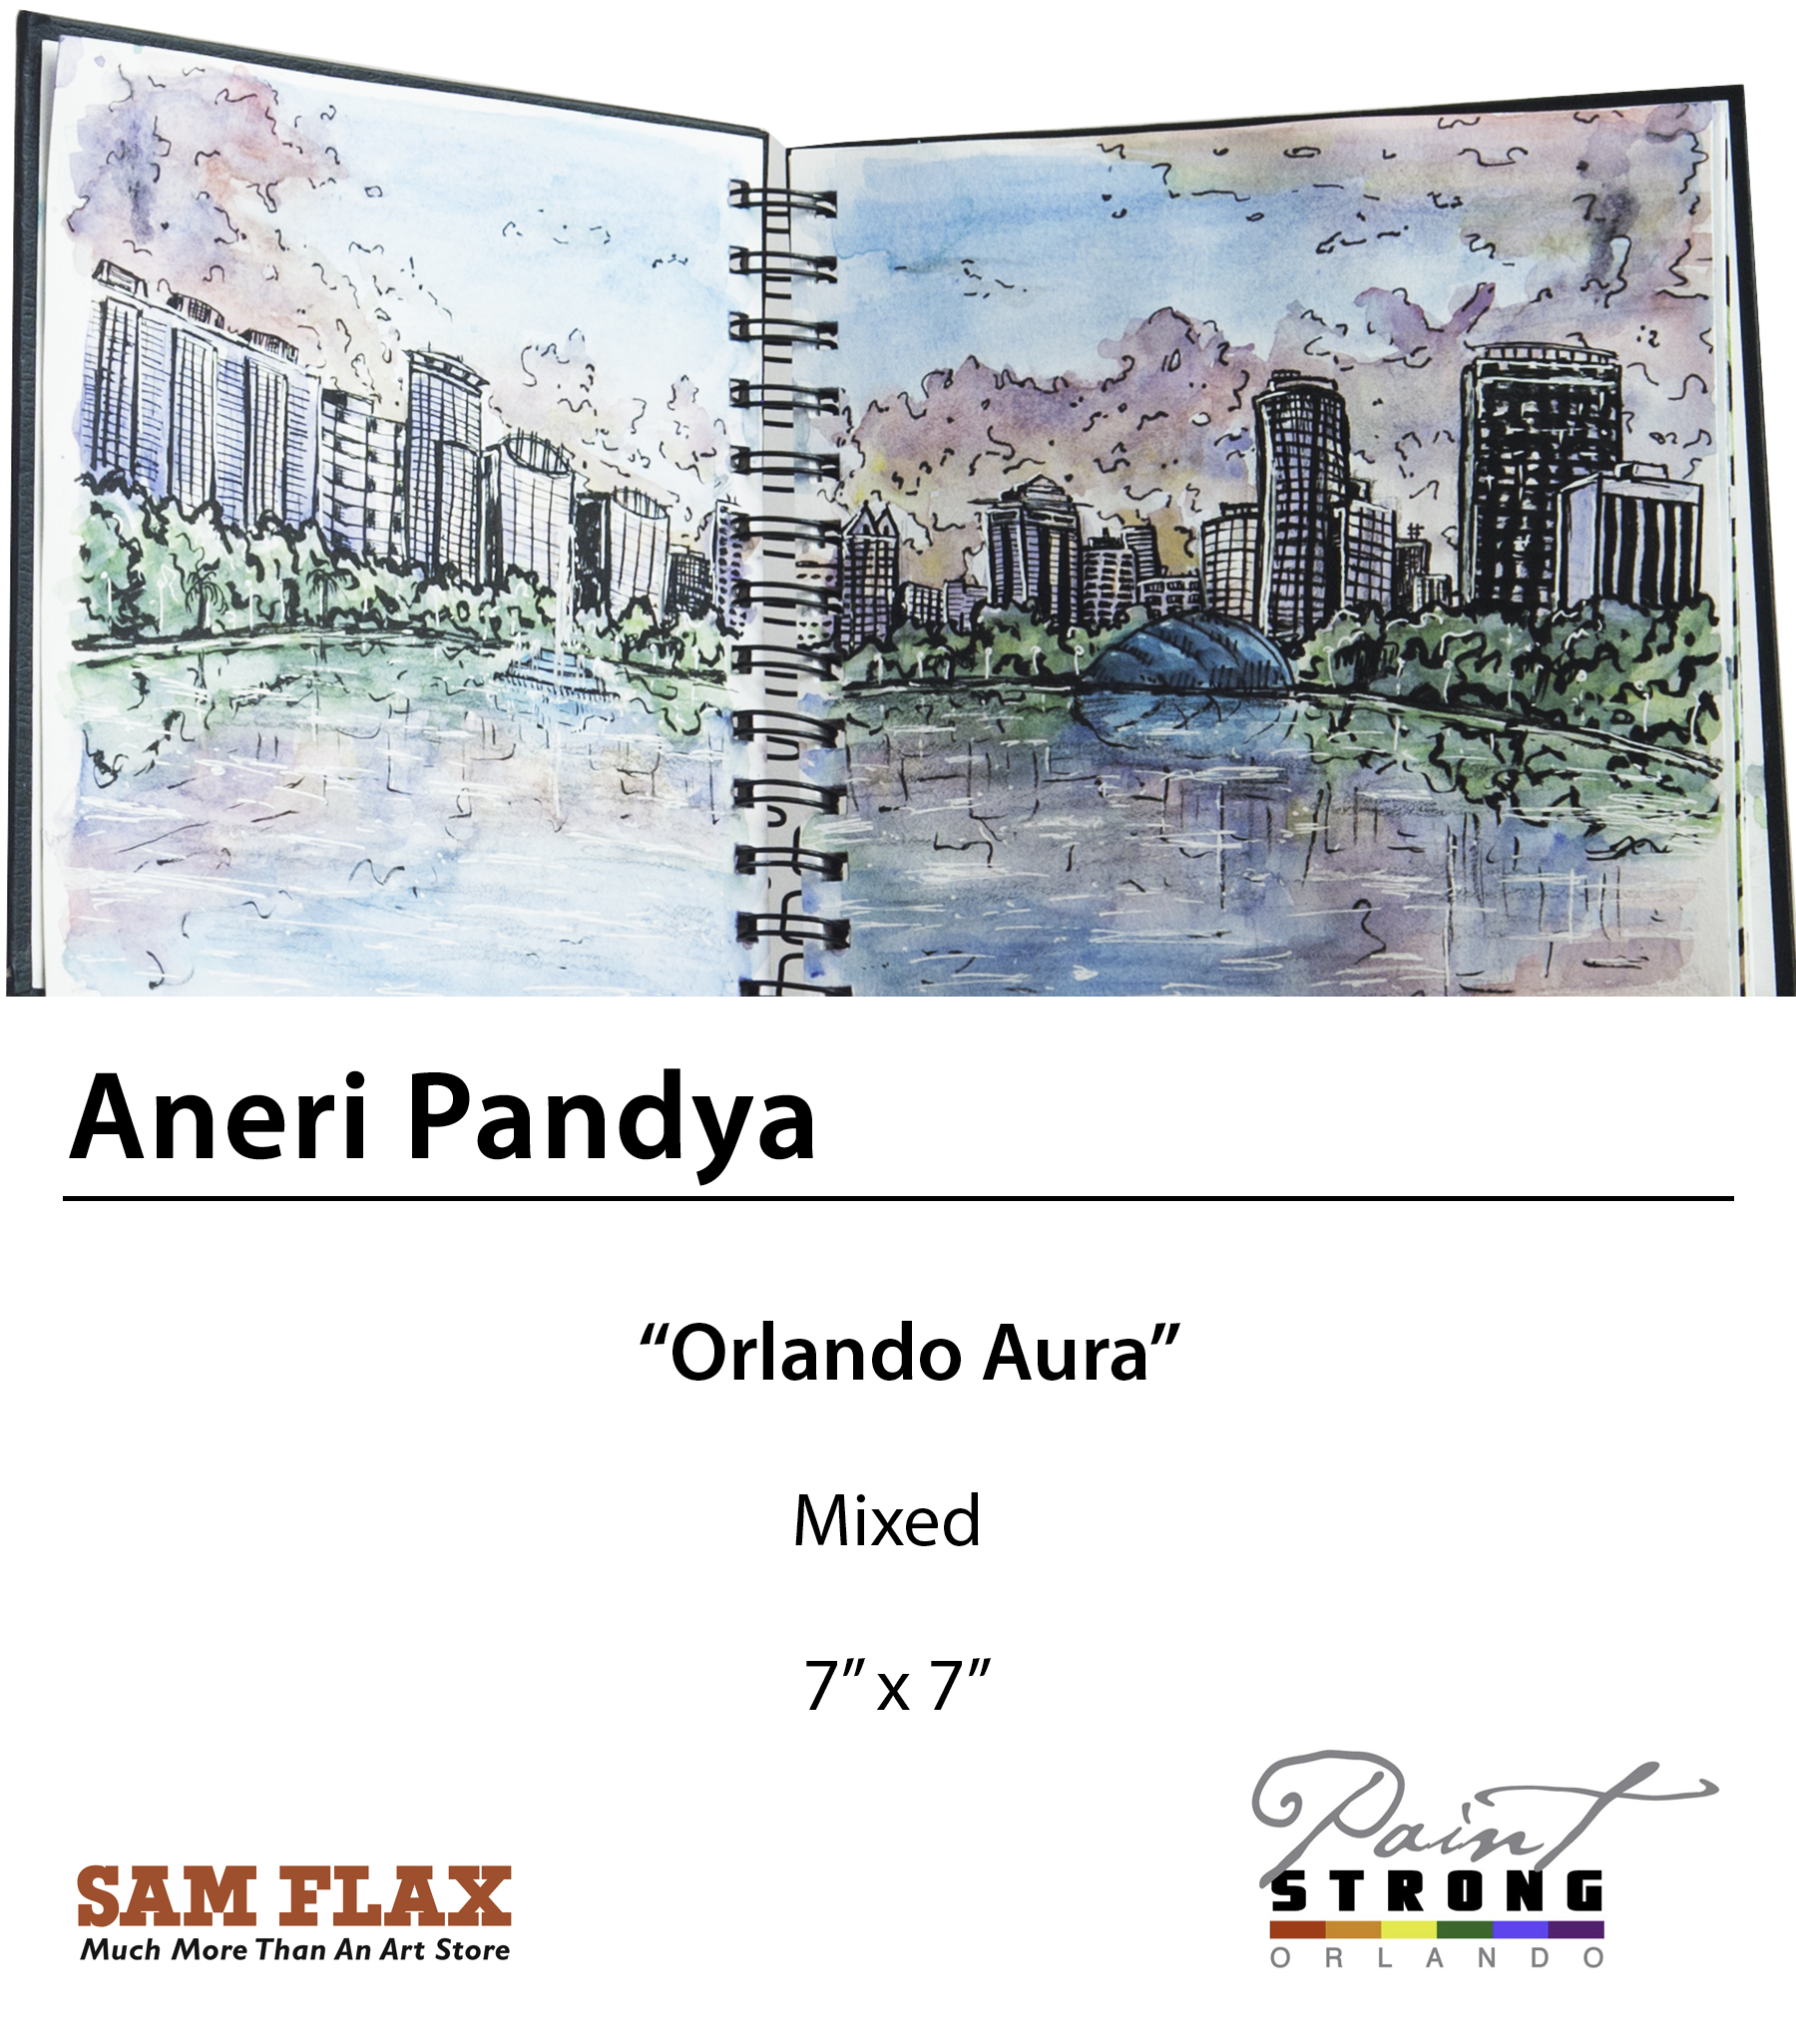 Aneri Pandya